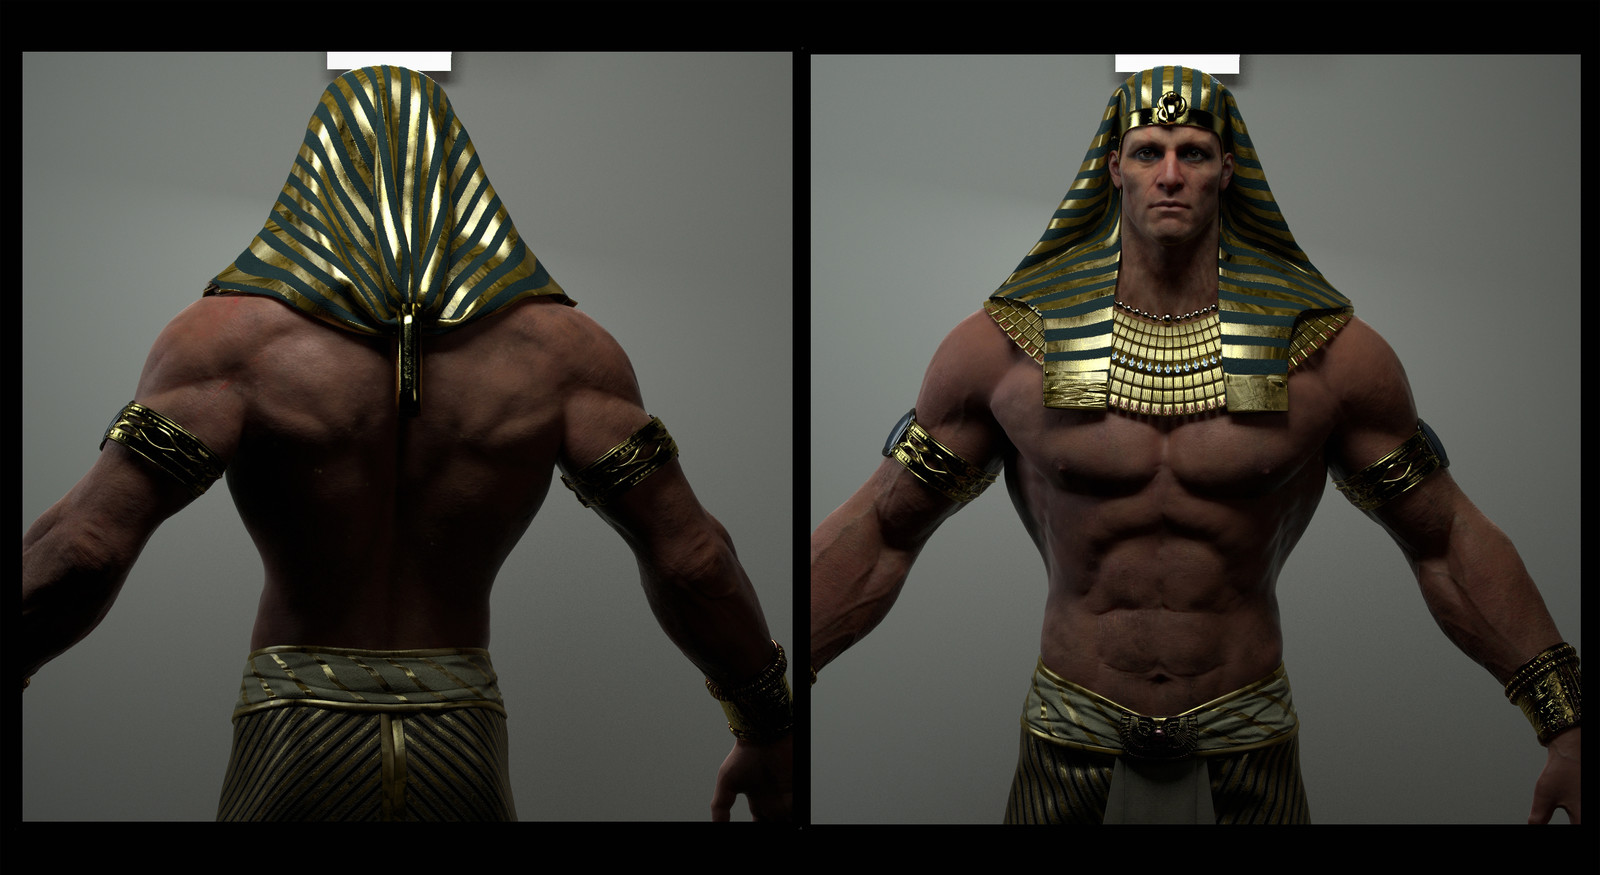 Horus character design